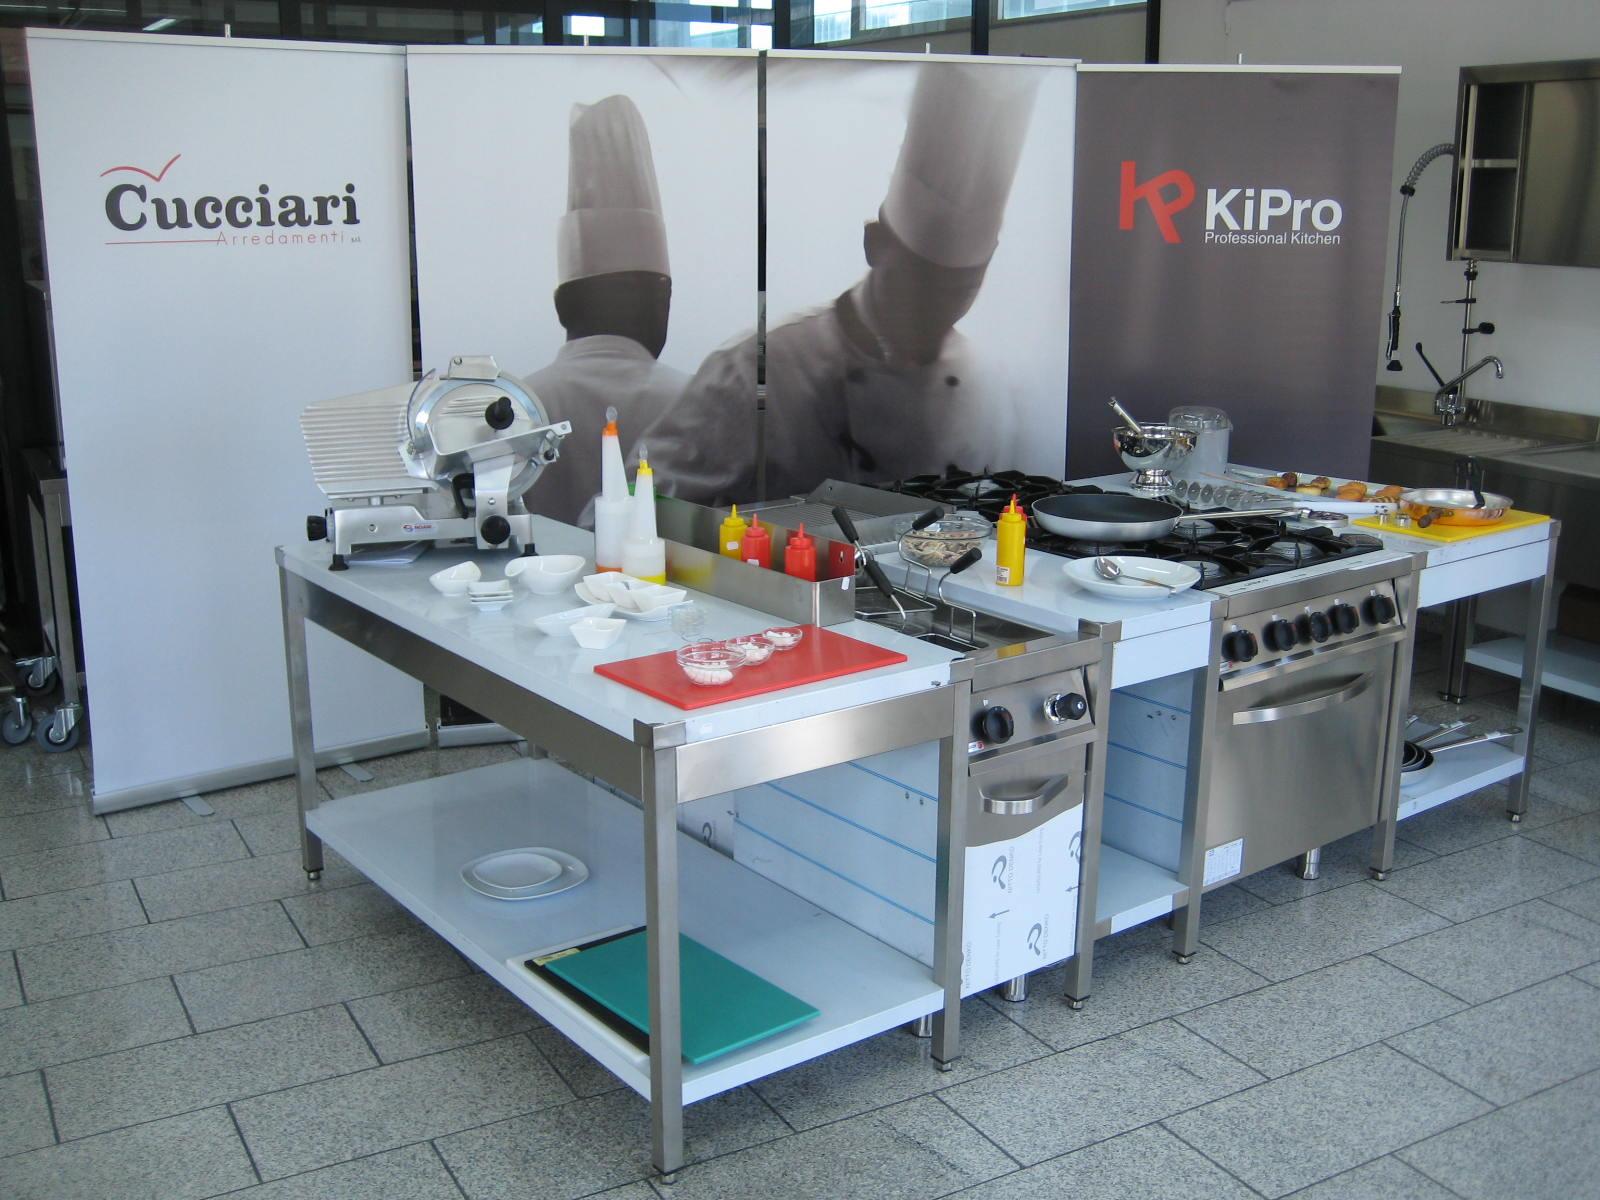 arredamenti ristoranti sardegna archivi - cucciari arredamenti ... - Attrezzature Professionali Cucina